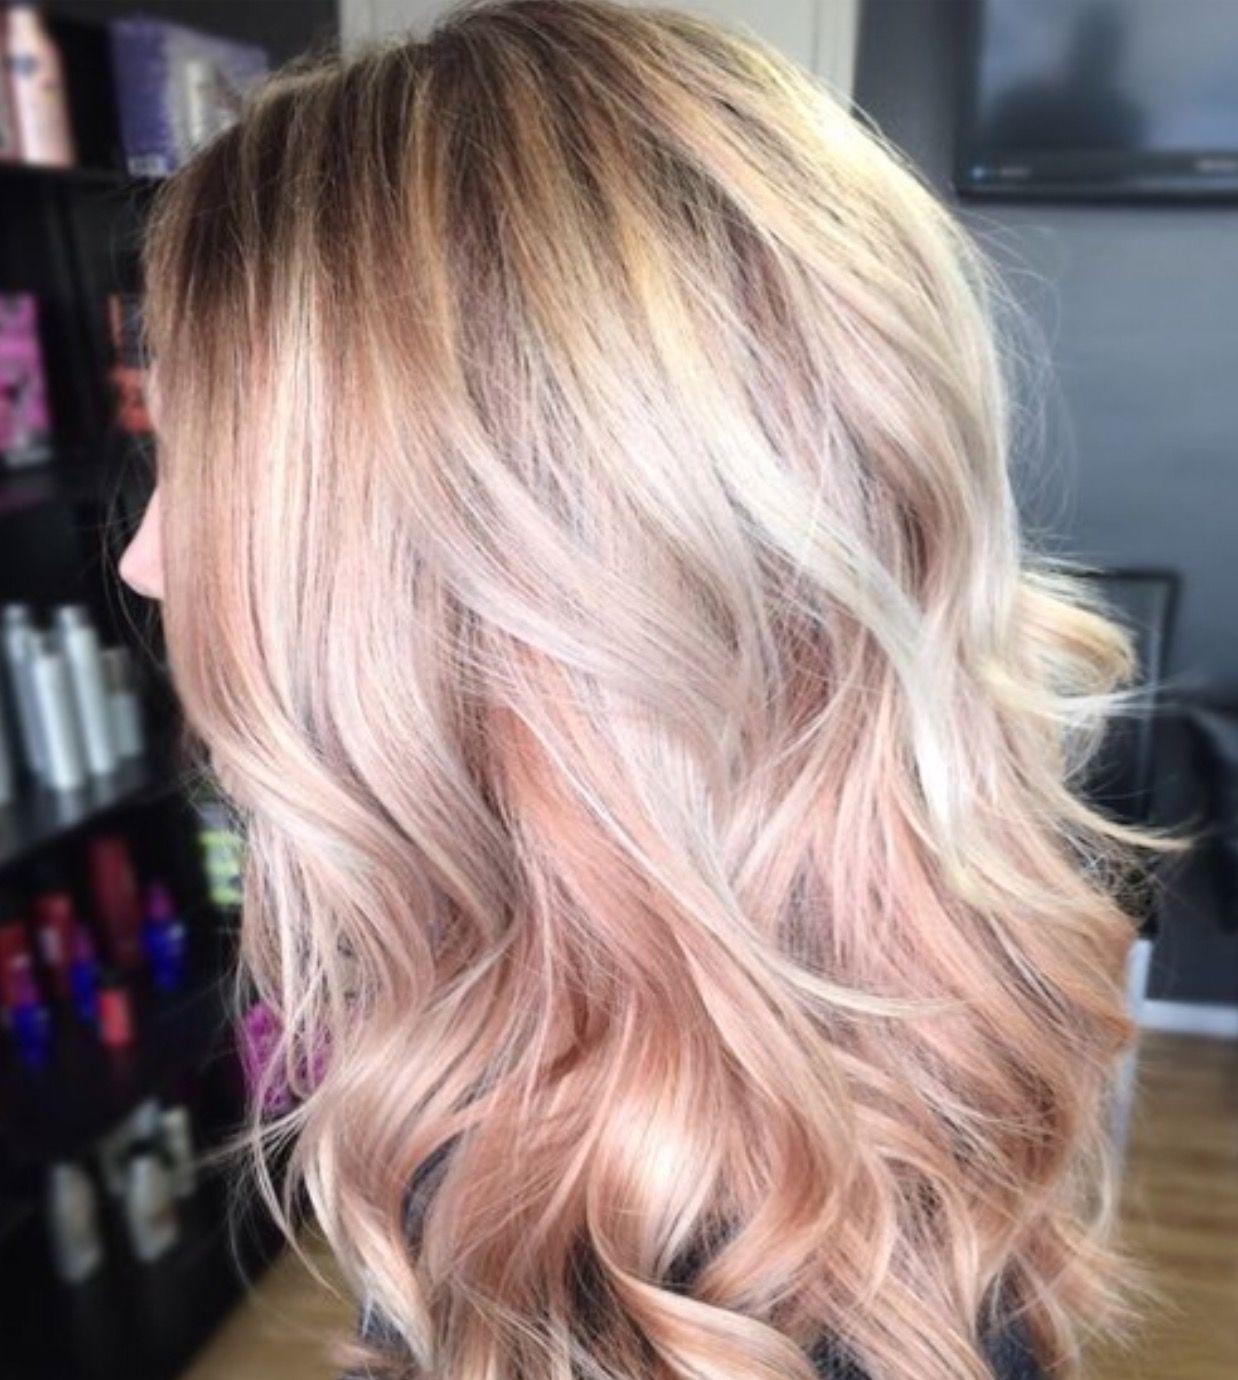 Pin by Kelley Bock on Hair | Dyed hair, Gold hair, Blonde hair